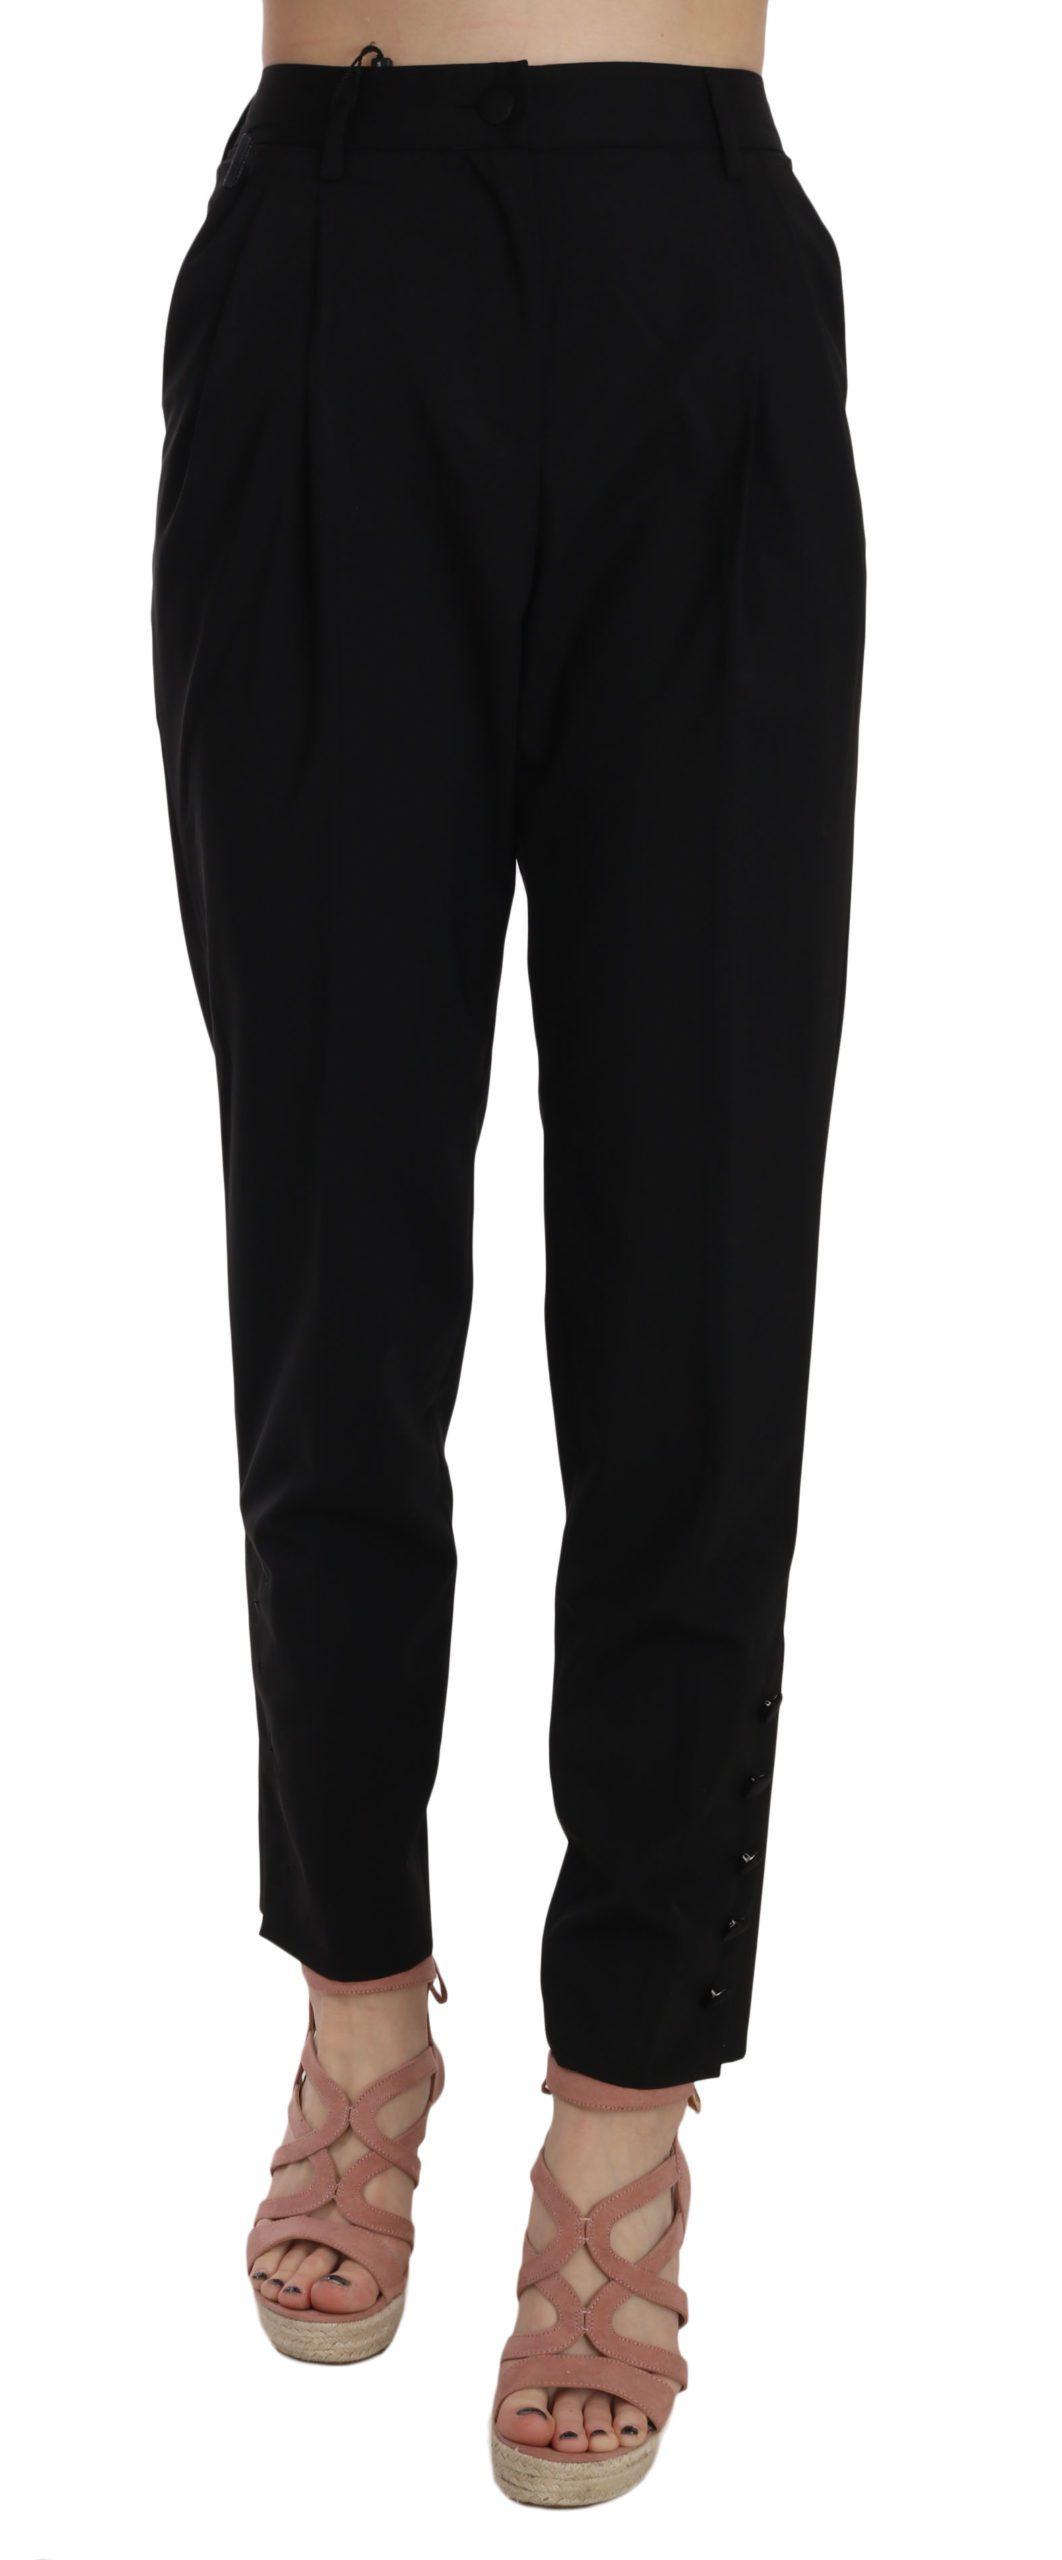 Dolce & Gabbana Women's Button Pleated Tapered Trouser Black PAN70033 - IT36 XXS